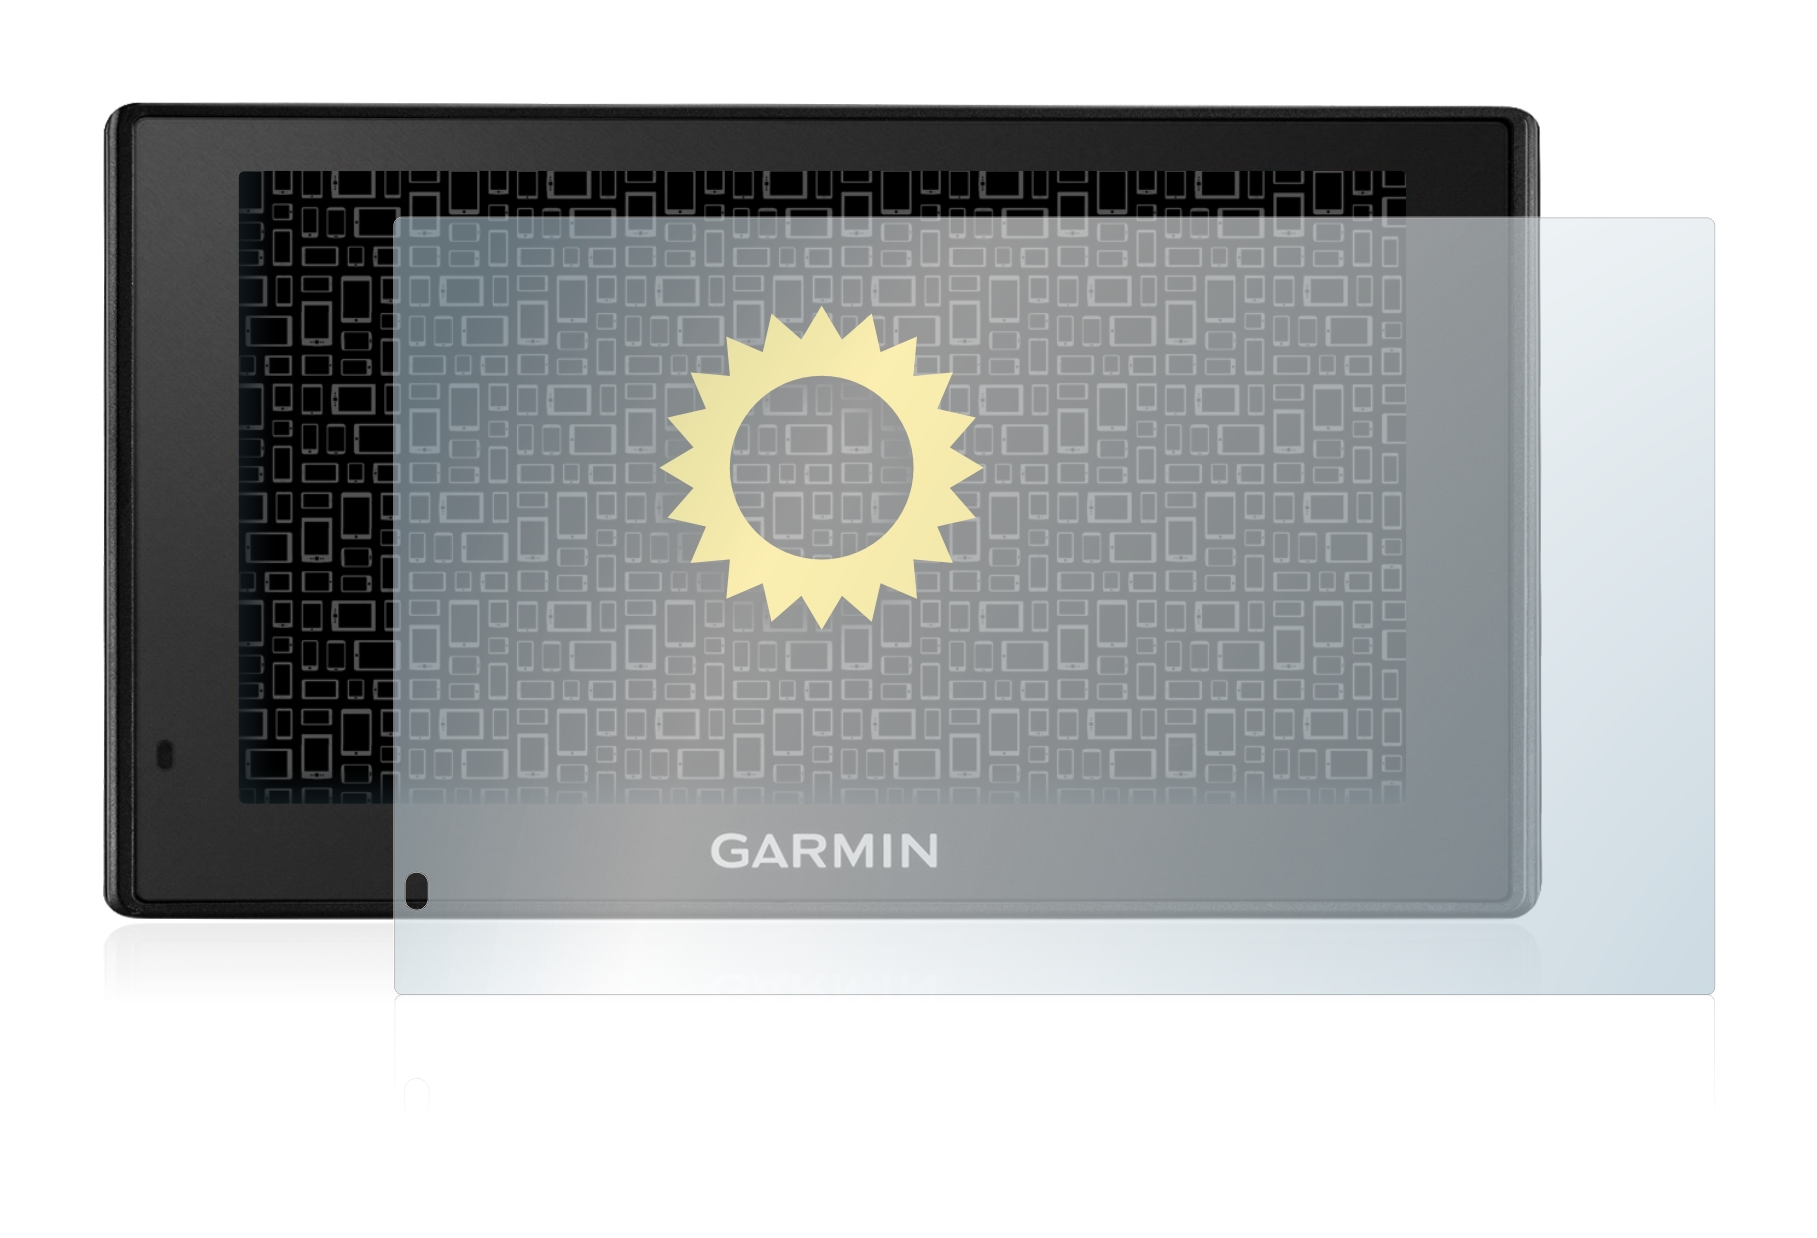 Vikuiti-Screen-Protector-DQCM30-from-3M-for-Garmin-DriveSmart-70-LMT-D-Matte